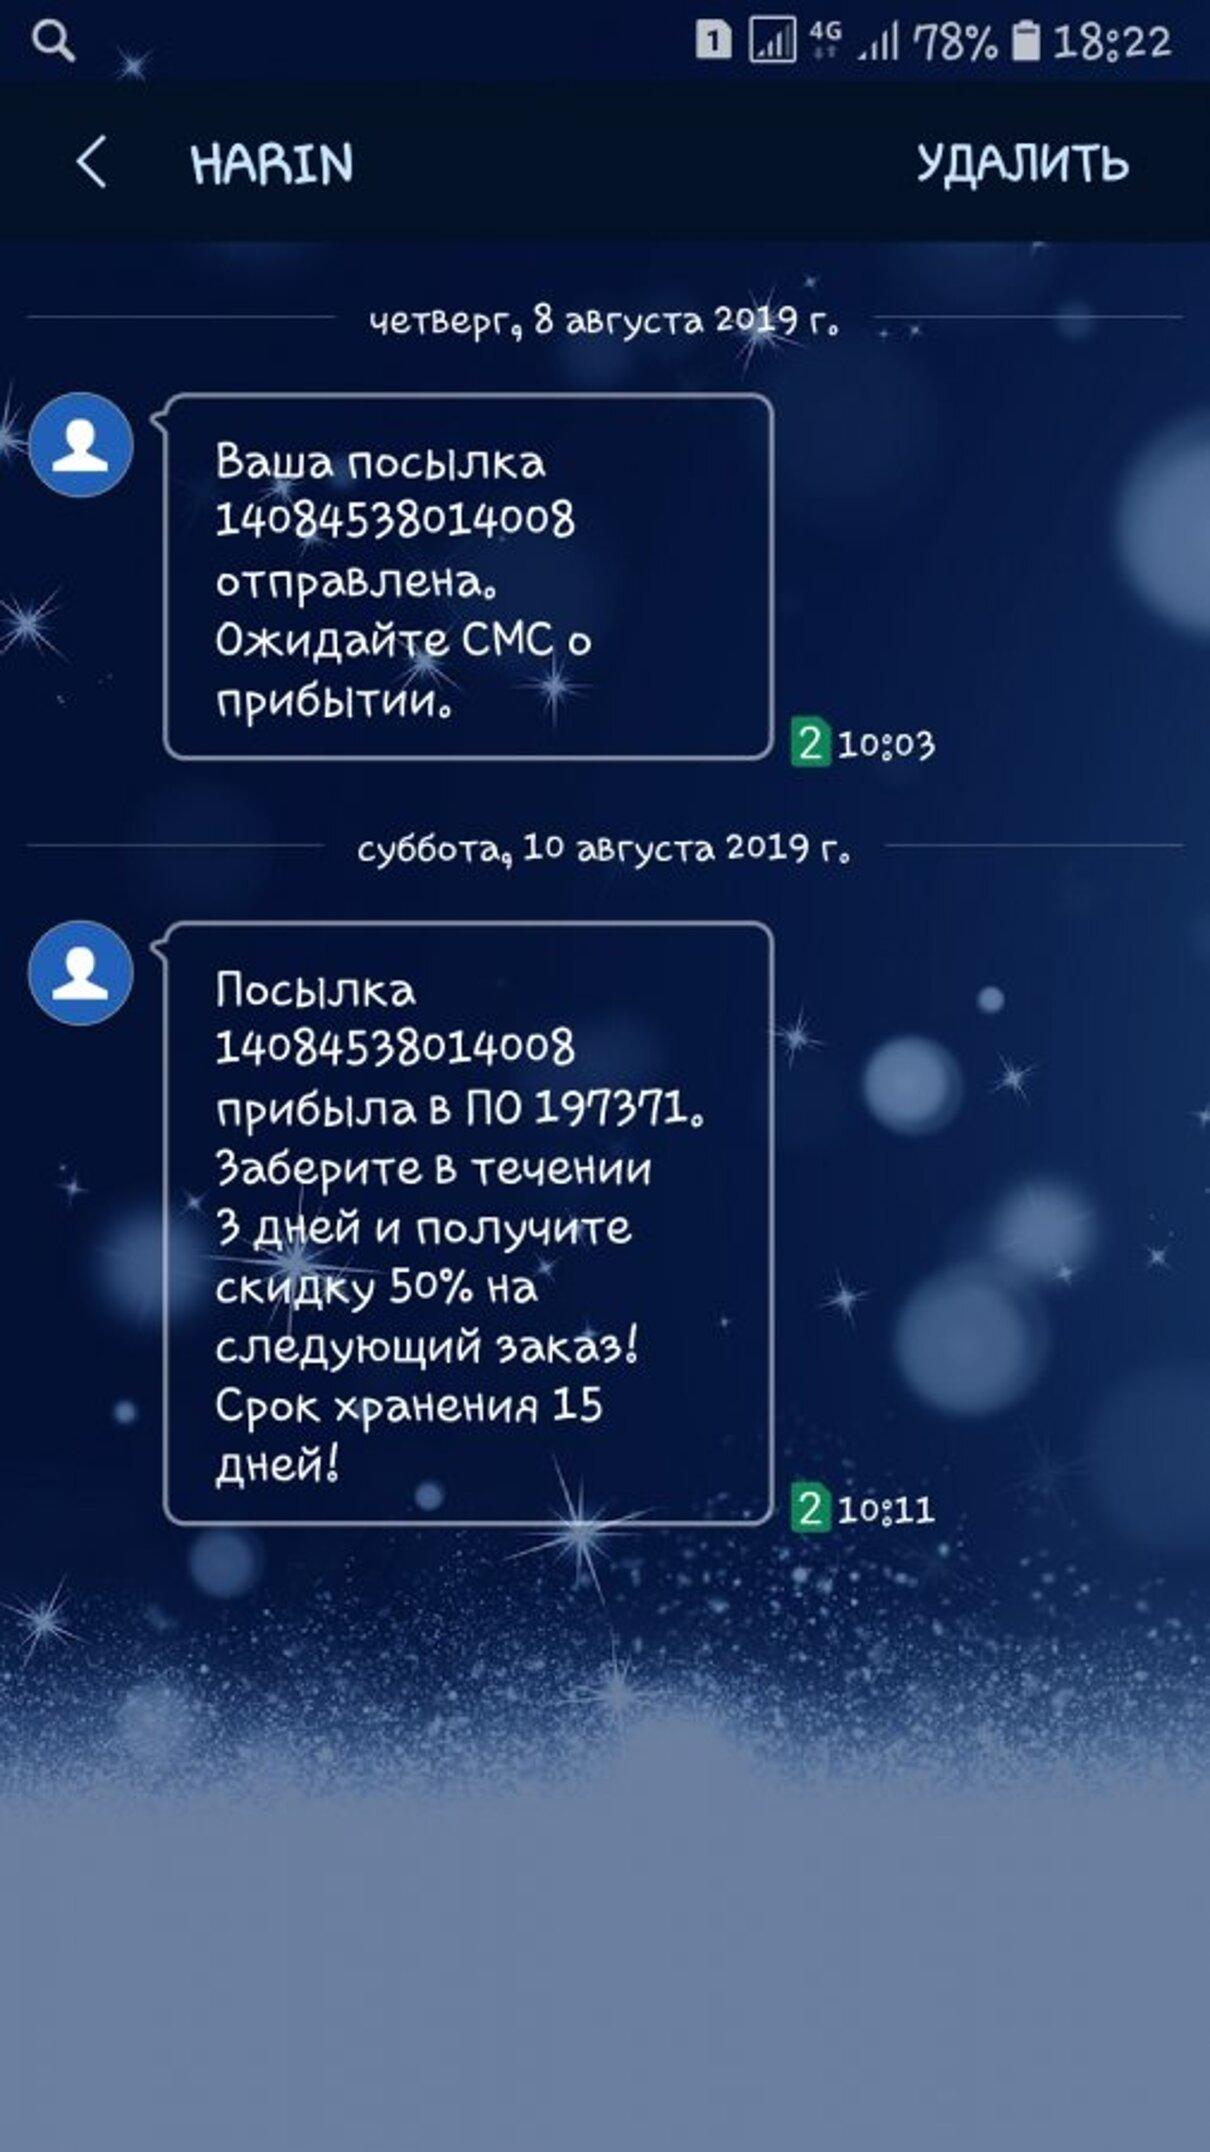 Жалоба-отзыв: Интернет магазин HARIN - Полный обман.  Фото №1